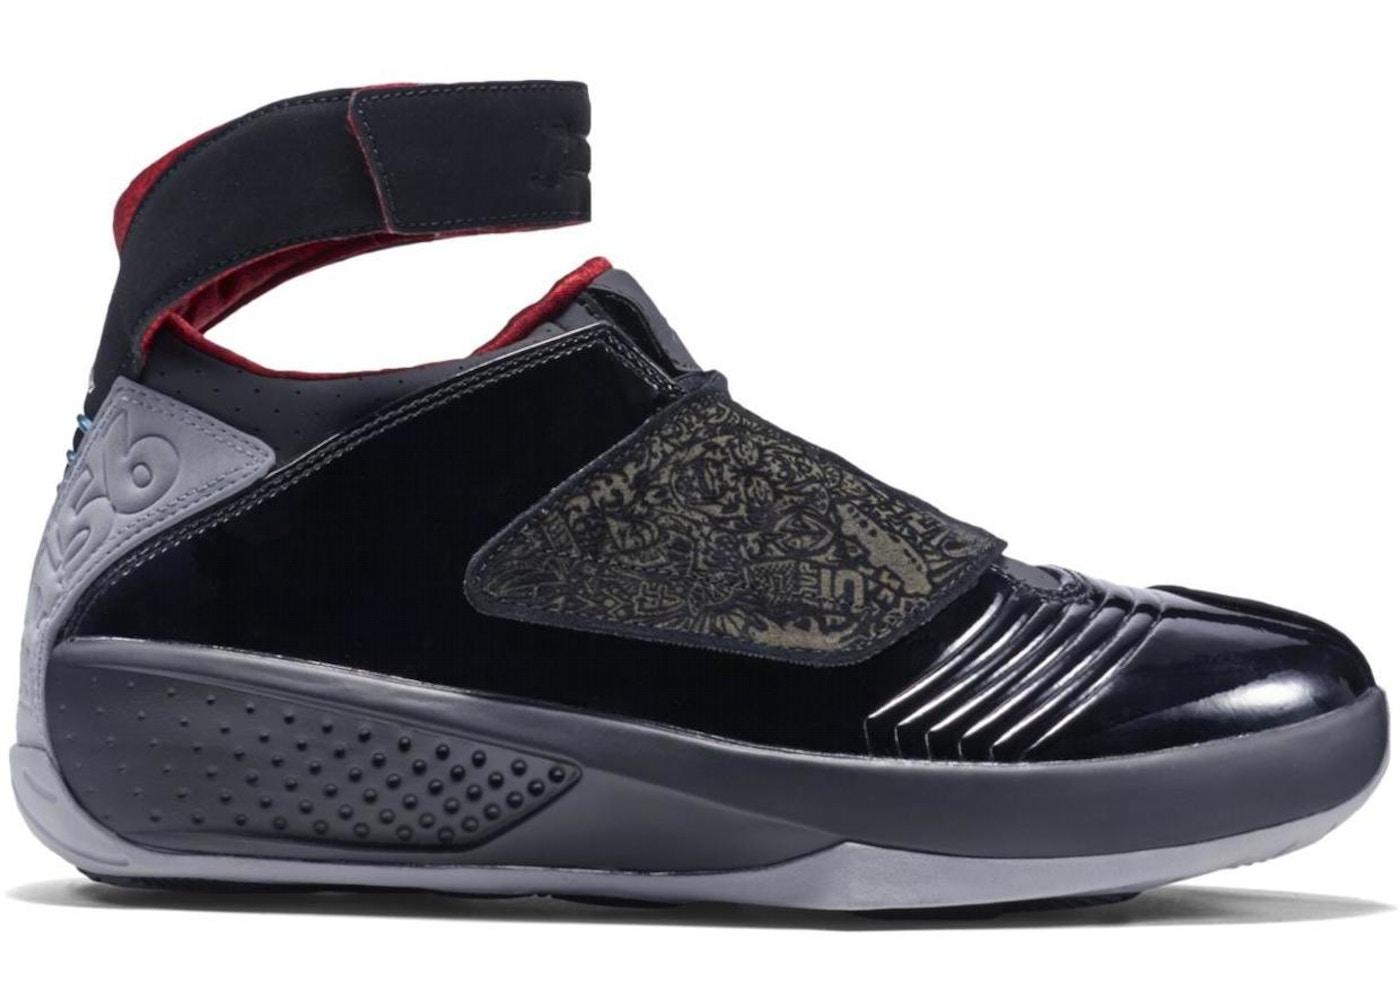 4bd6cc4cc70988 Jordan 20 Retro Stealth (2015) - 310455-002